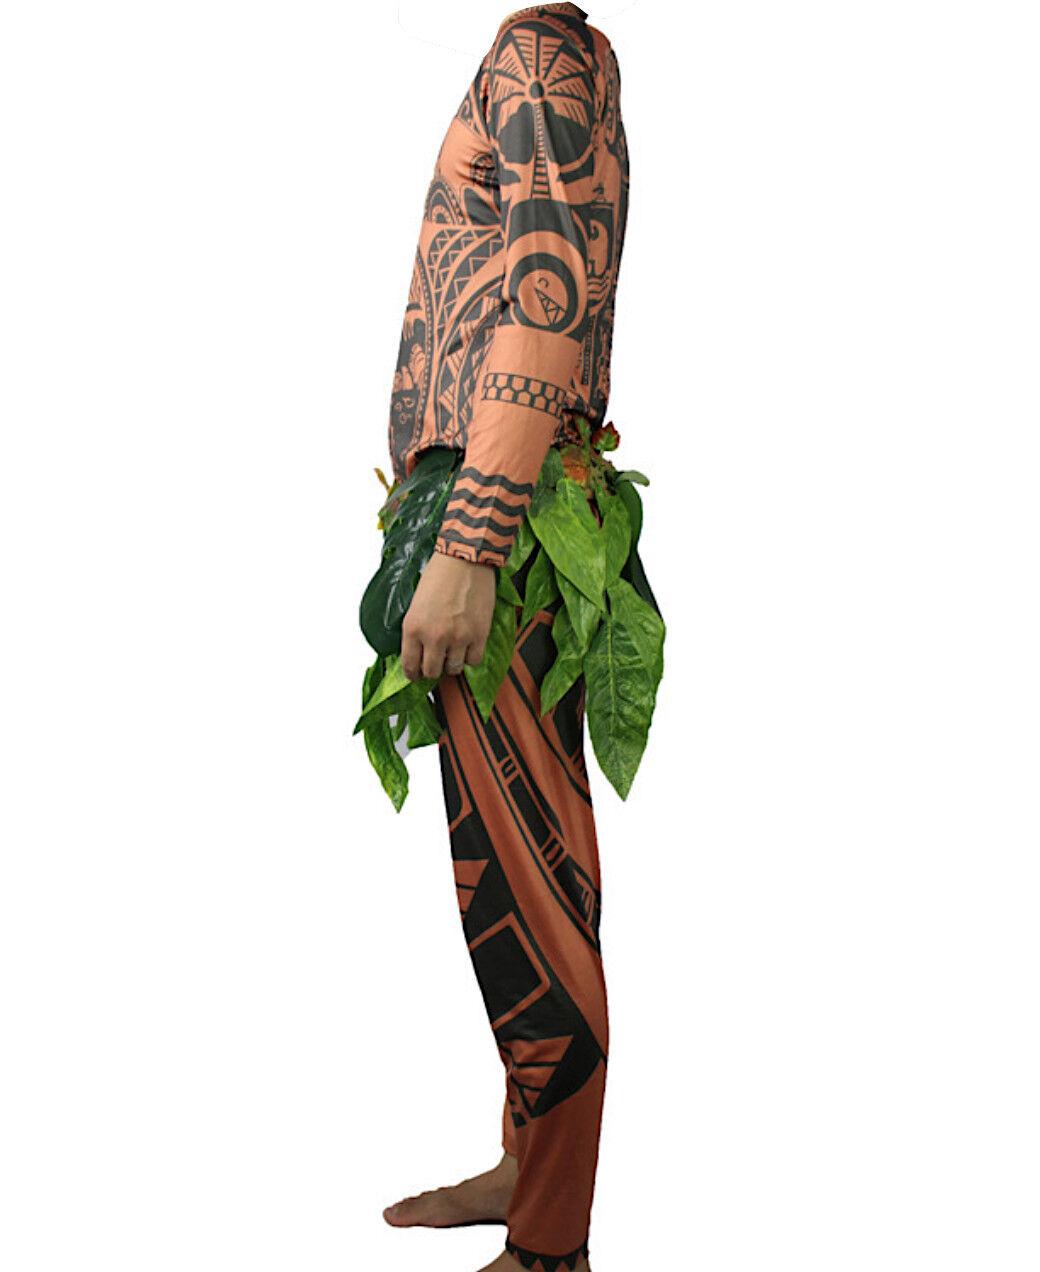 vestito maui oceania  Tipo Maui Vaiana Costume Carnevale Uomo Animazione Cosplay Maui ...